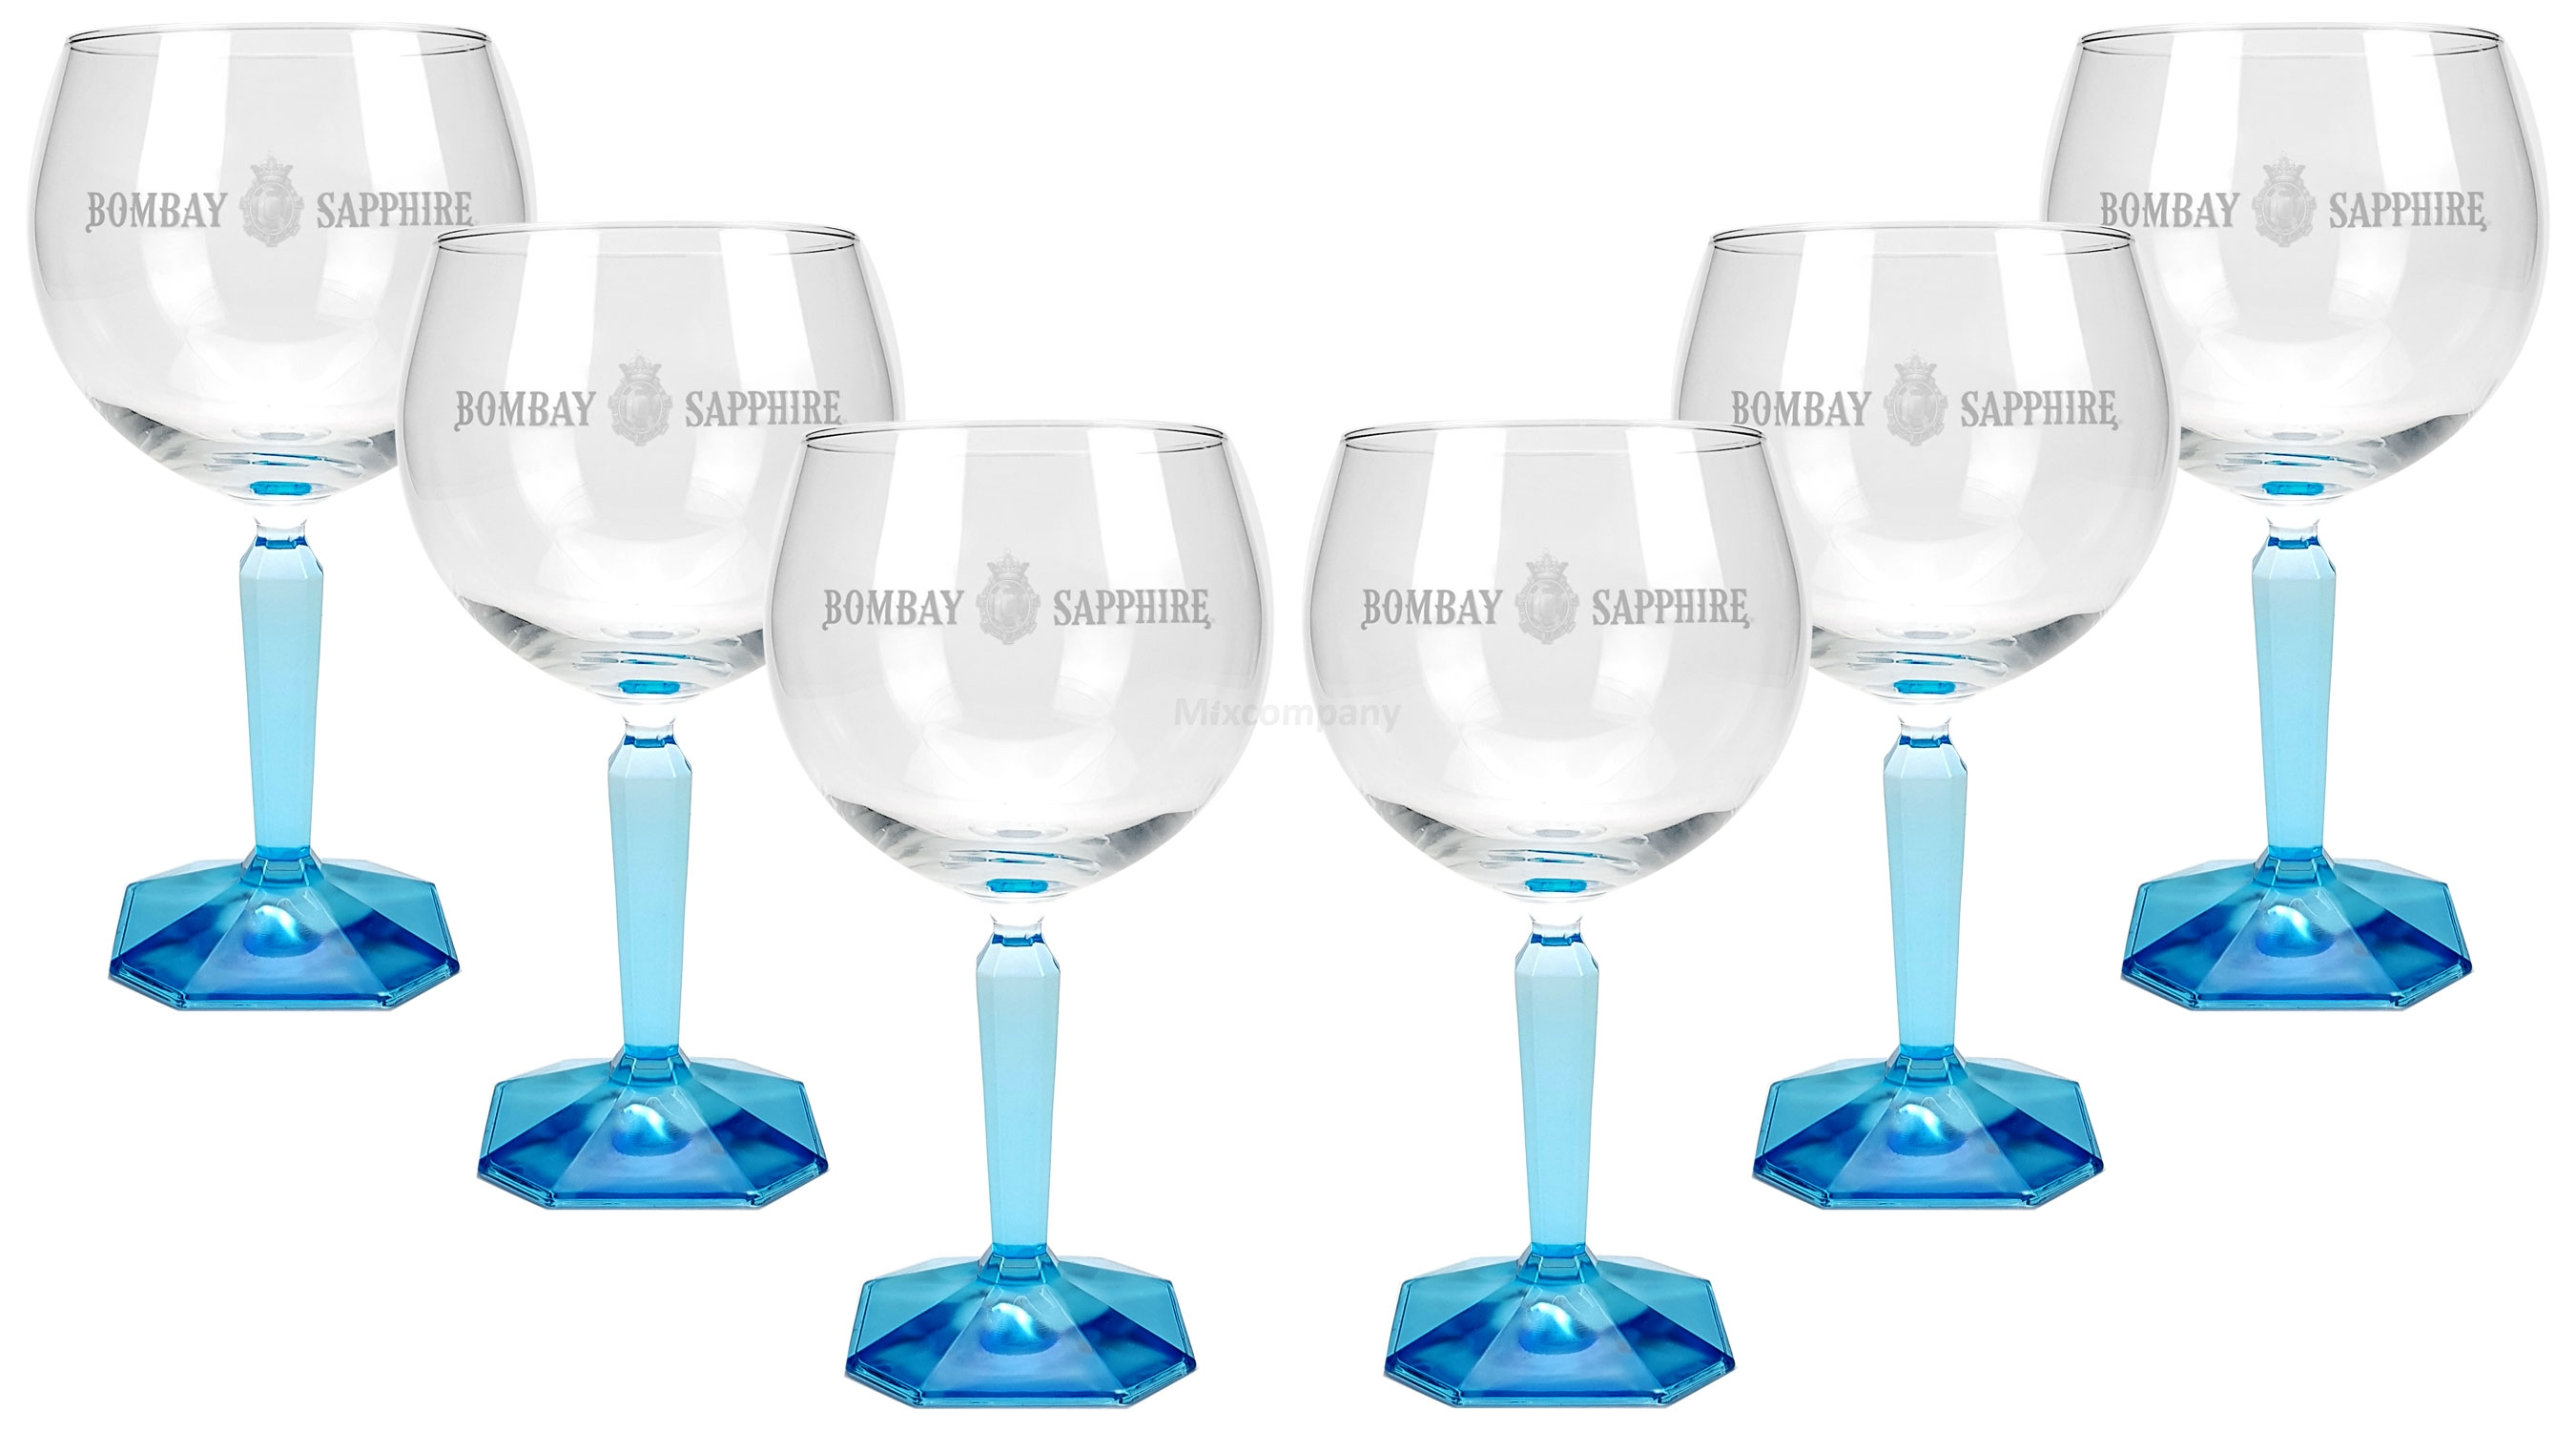 Bombay Sapphire Ballon Cocktail Glas Gläser - 6er Set